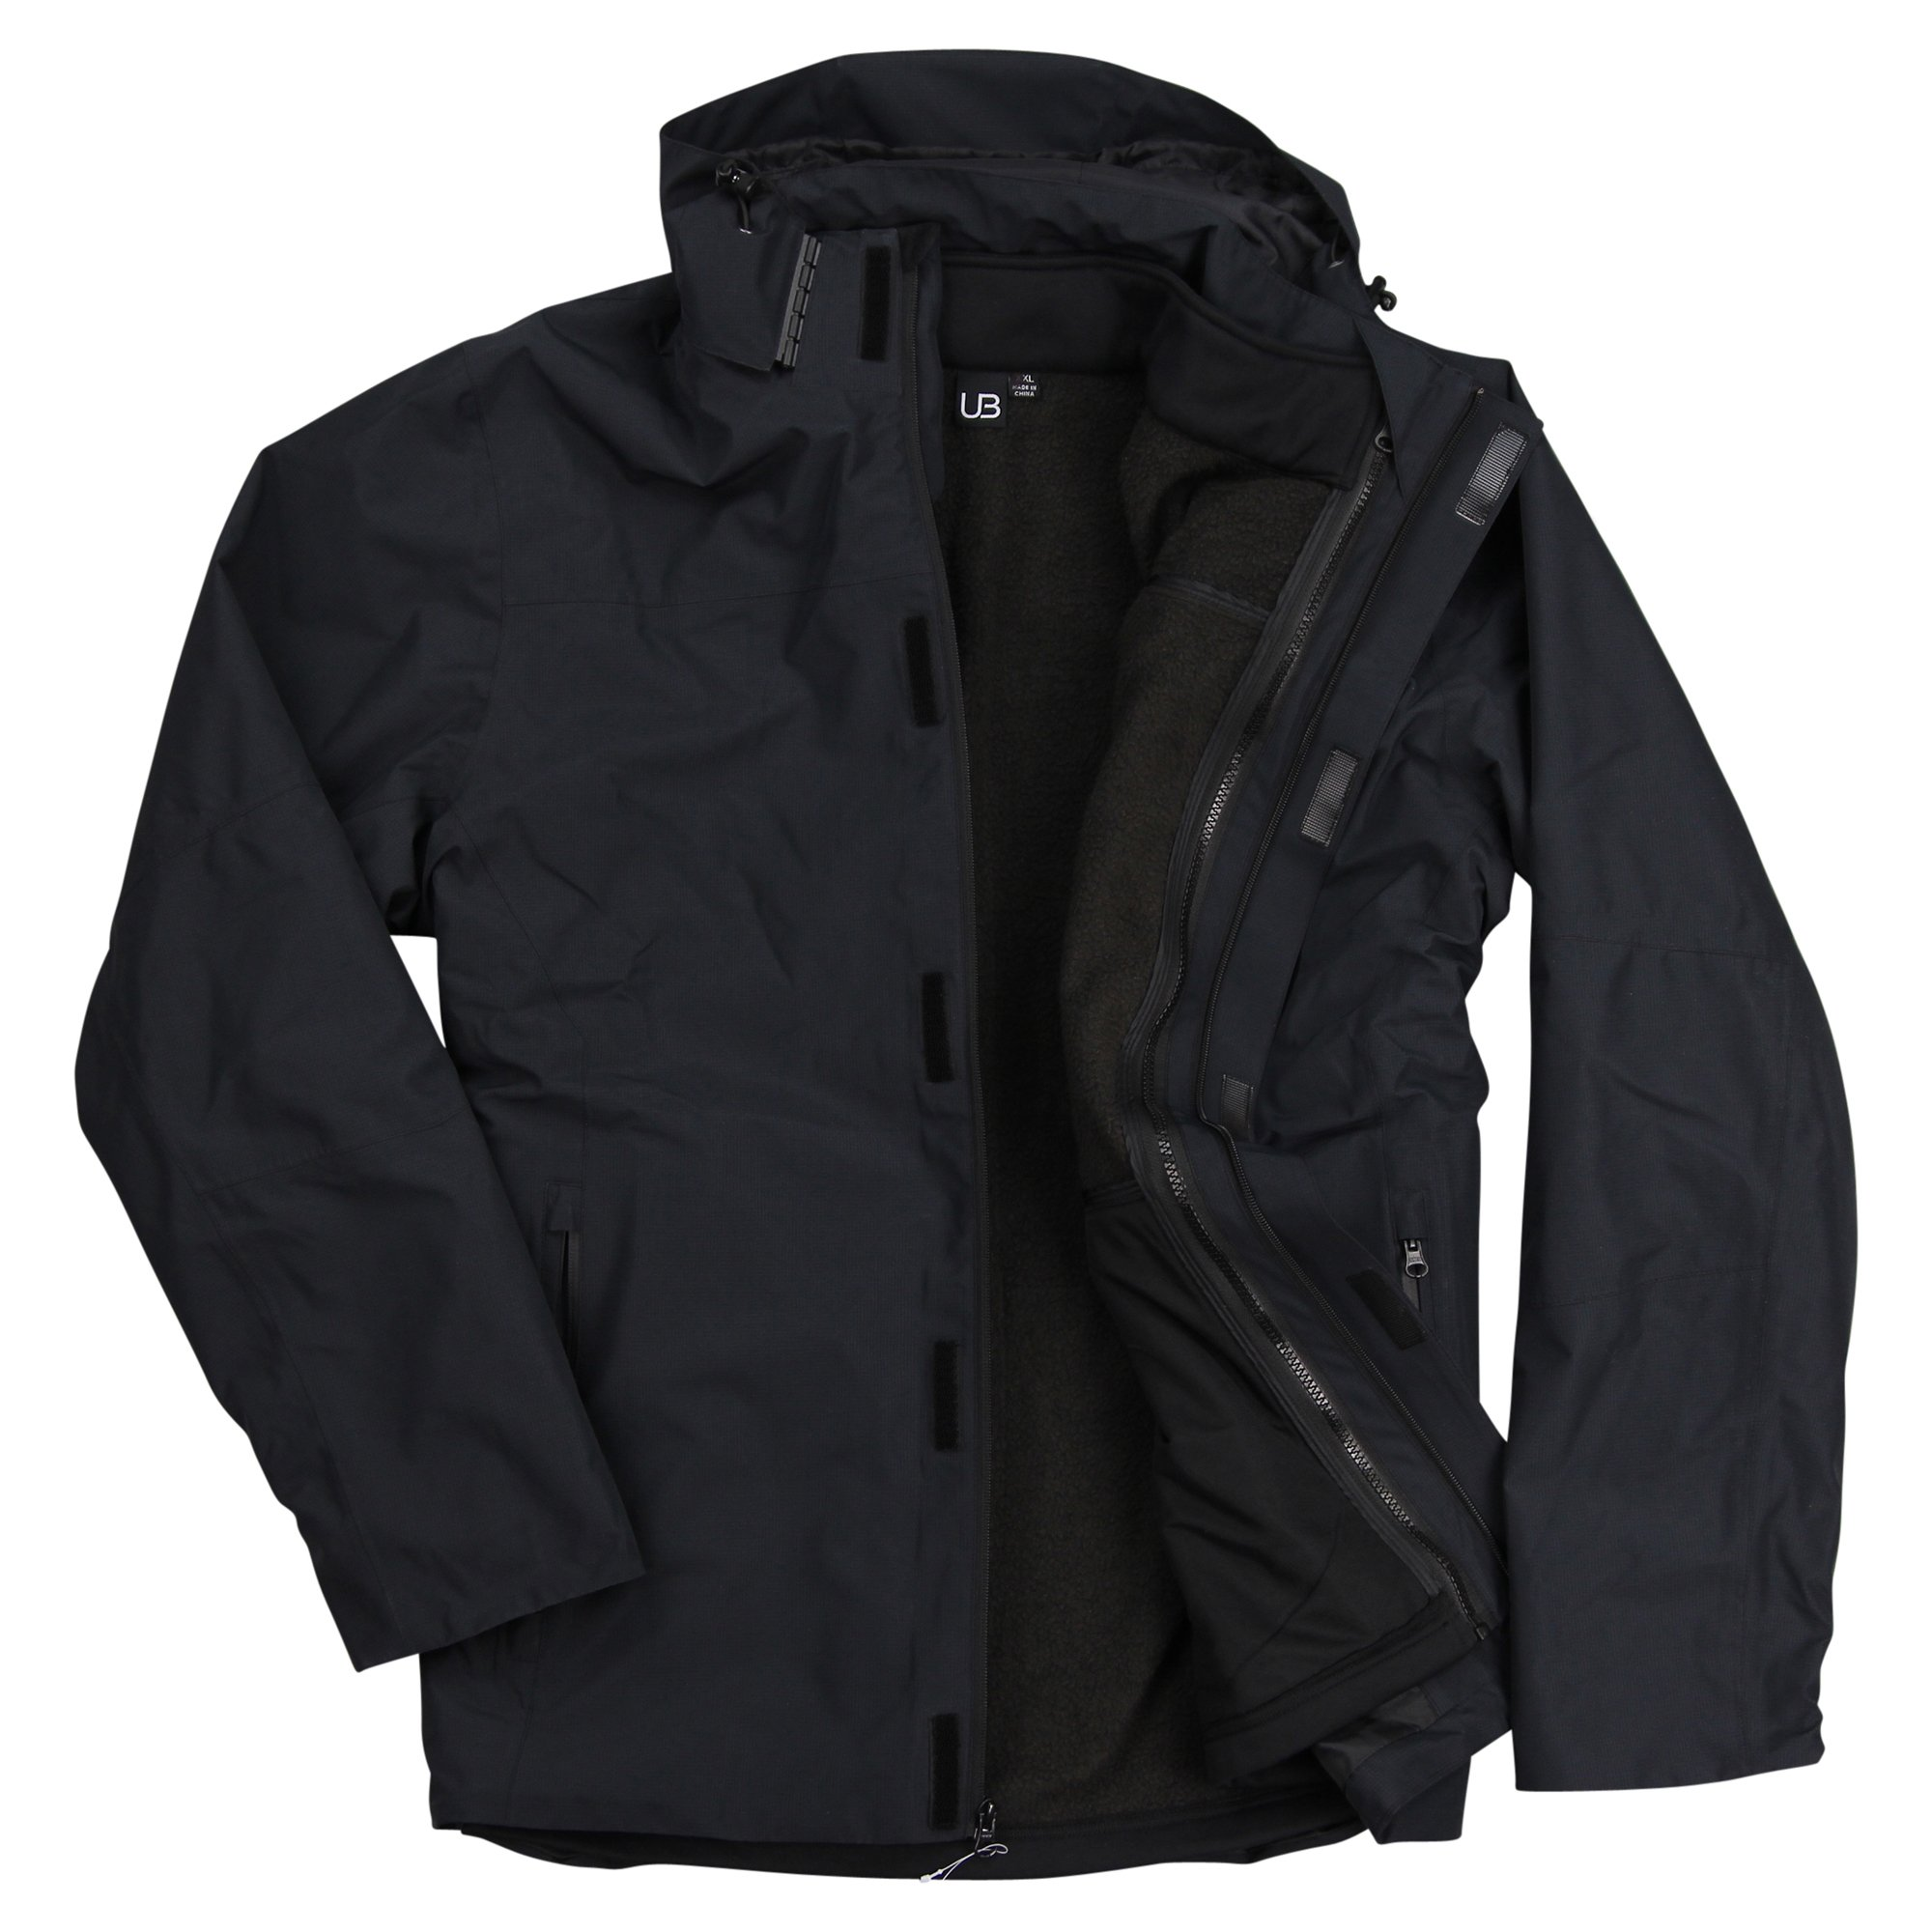 Men's Ripstop 3-in-1 Cold Defender Waterproof Winter Ski Coat (Black, Large) by Urban Boundaries